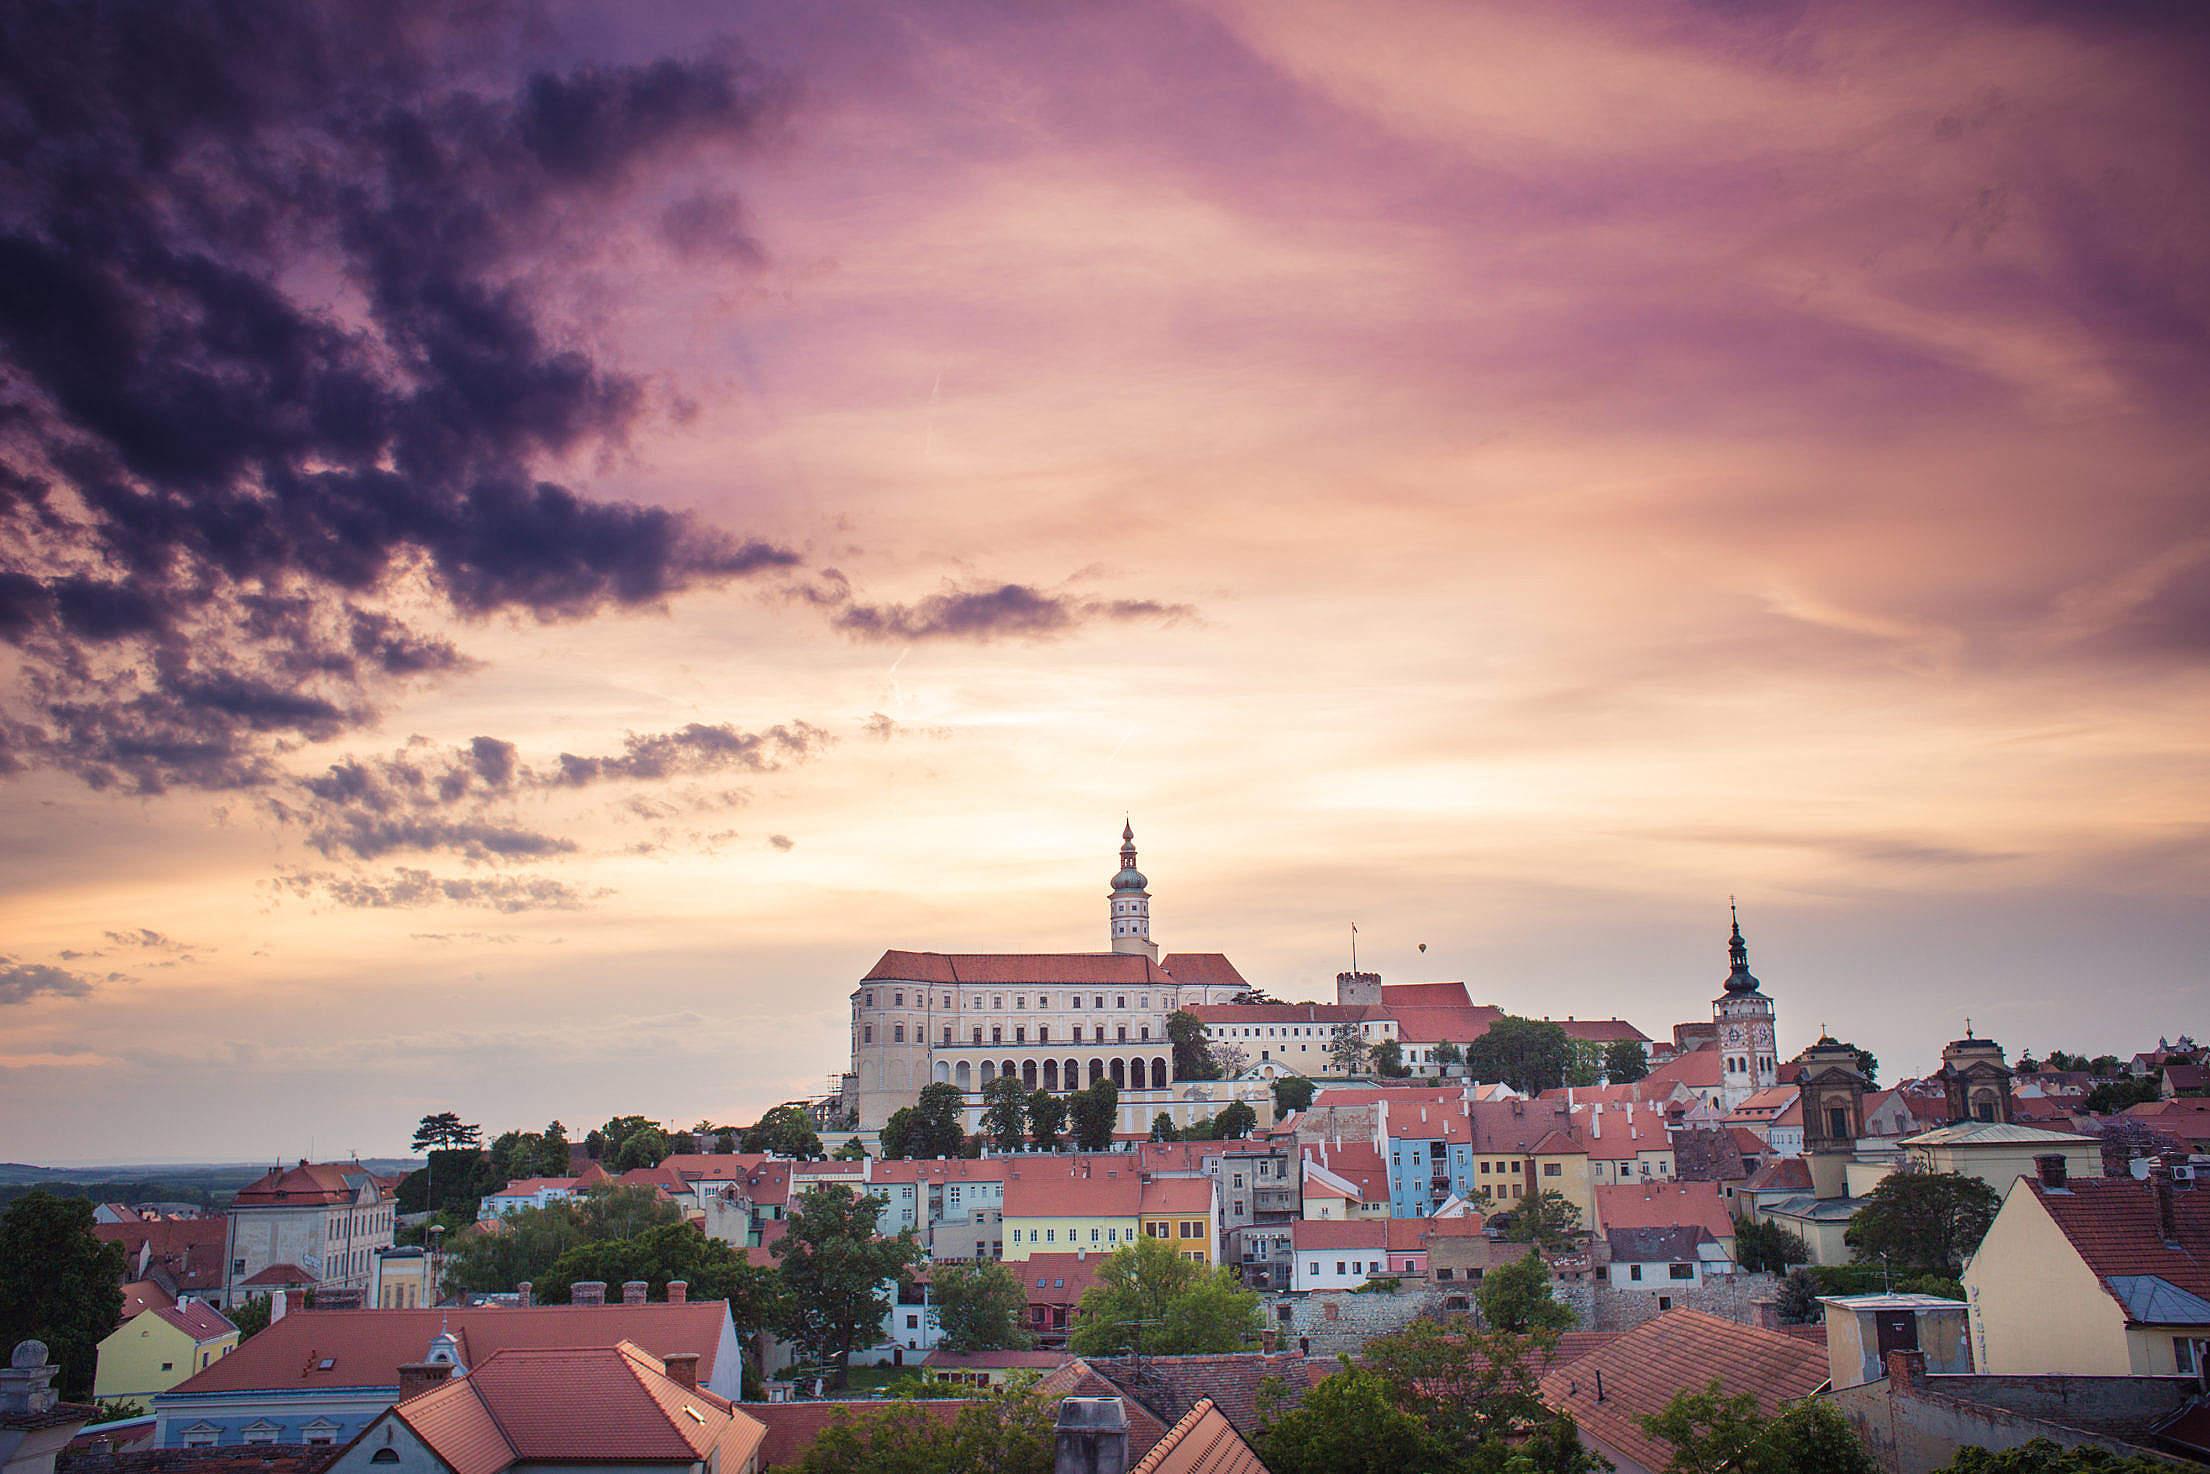 Mikulov City Landscape, Czech Republic Free Stock Photo